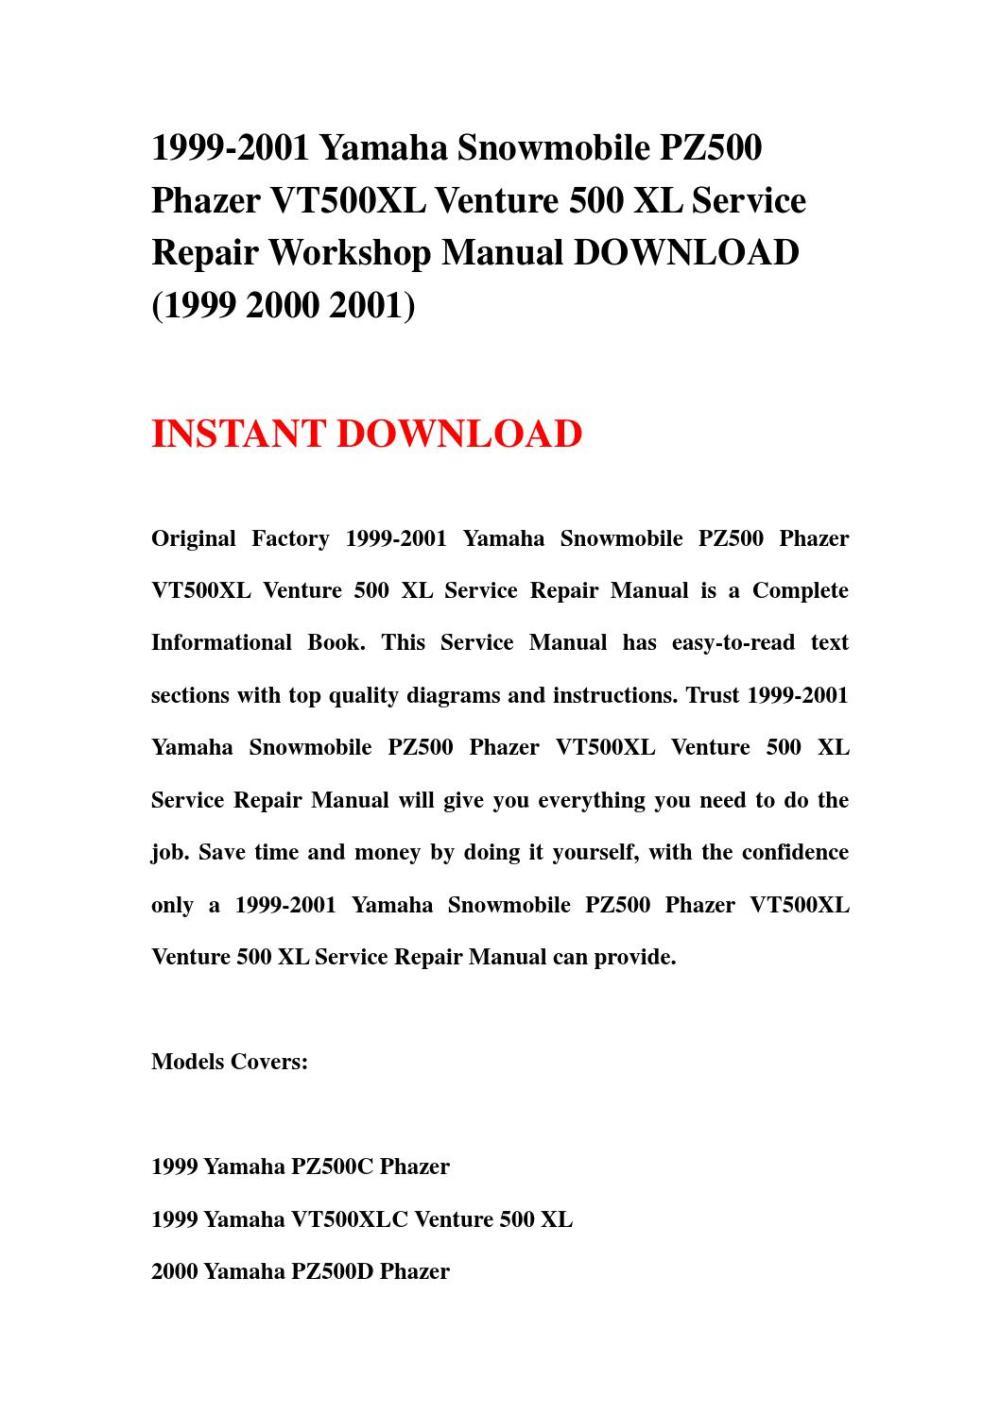 medium resolution of 1999 2001 yamaha snowmobile pz500 phazer vt500xl venture 500 xl service repair workshop manual downl